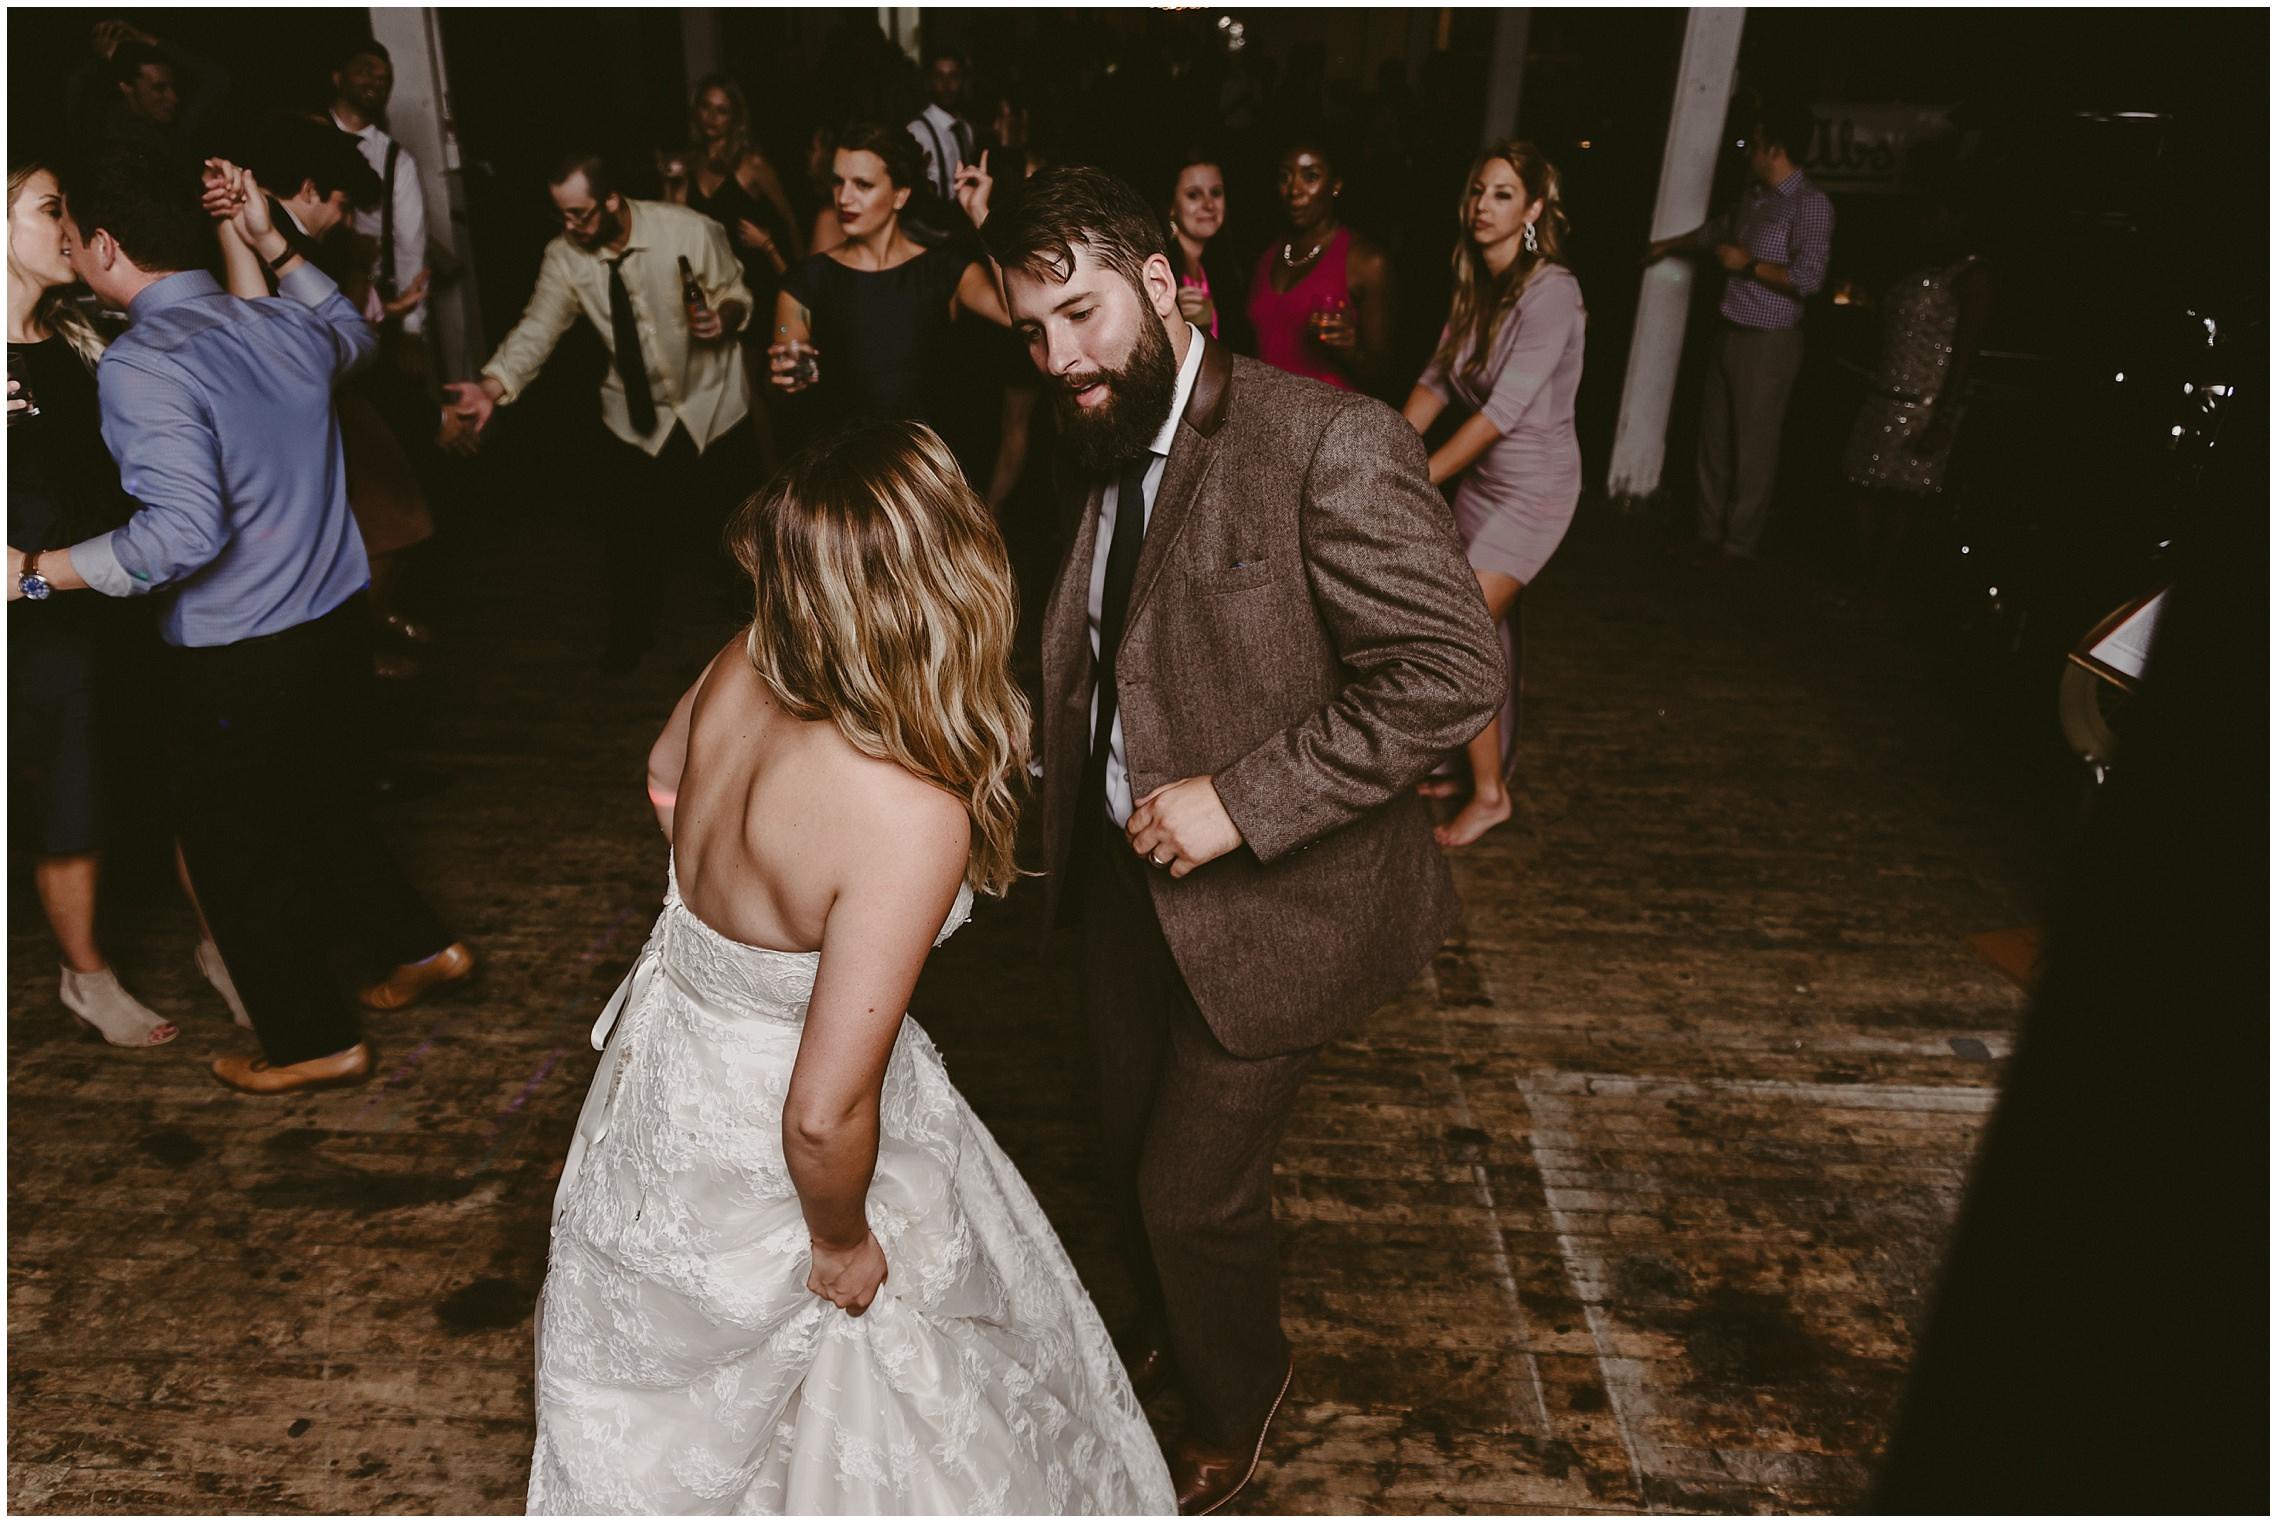 brick_and_mortar_colorado_wedding_photographer_0267.jpg